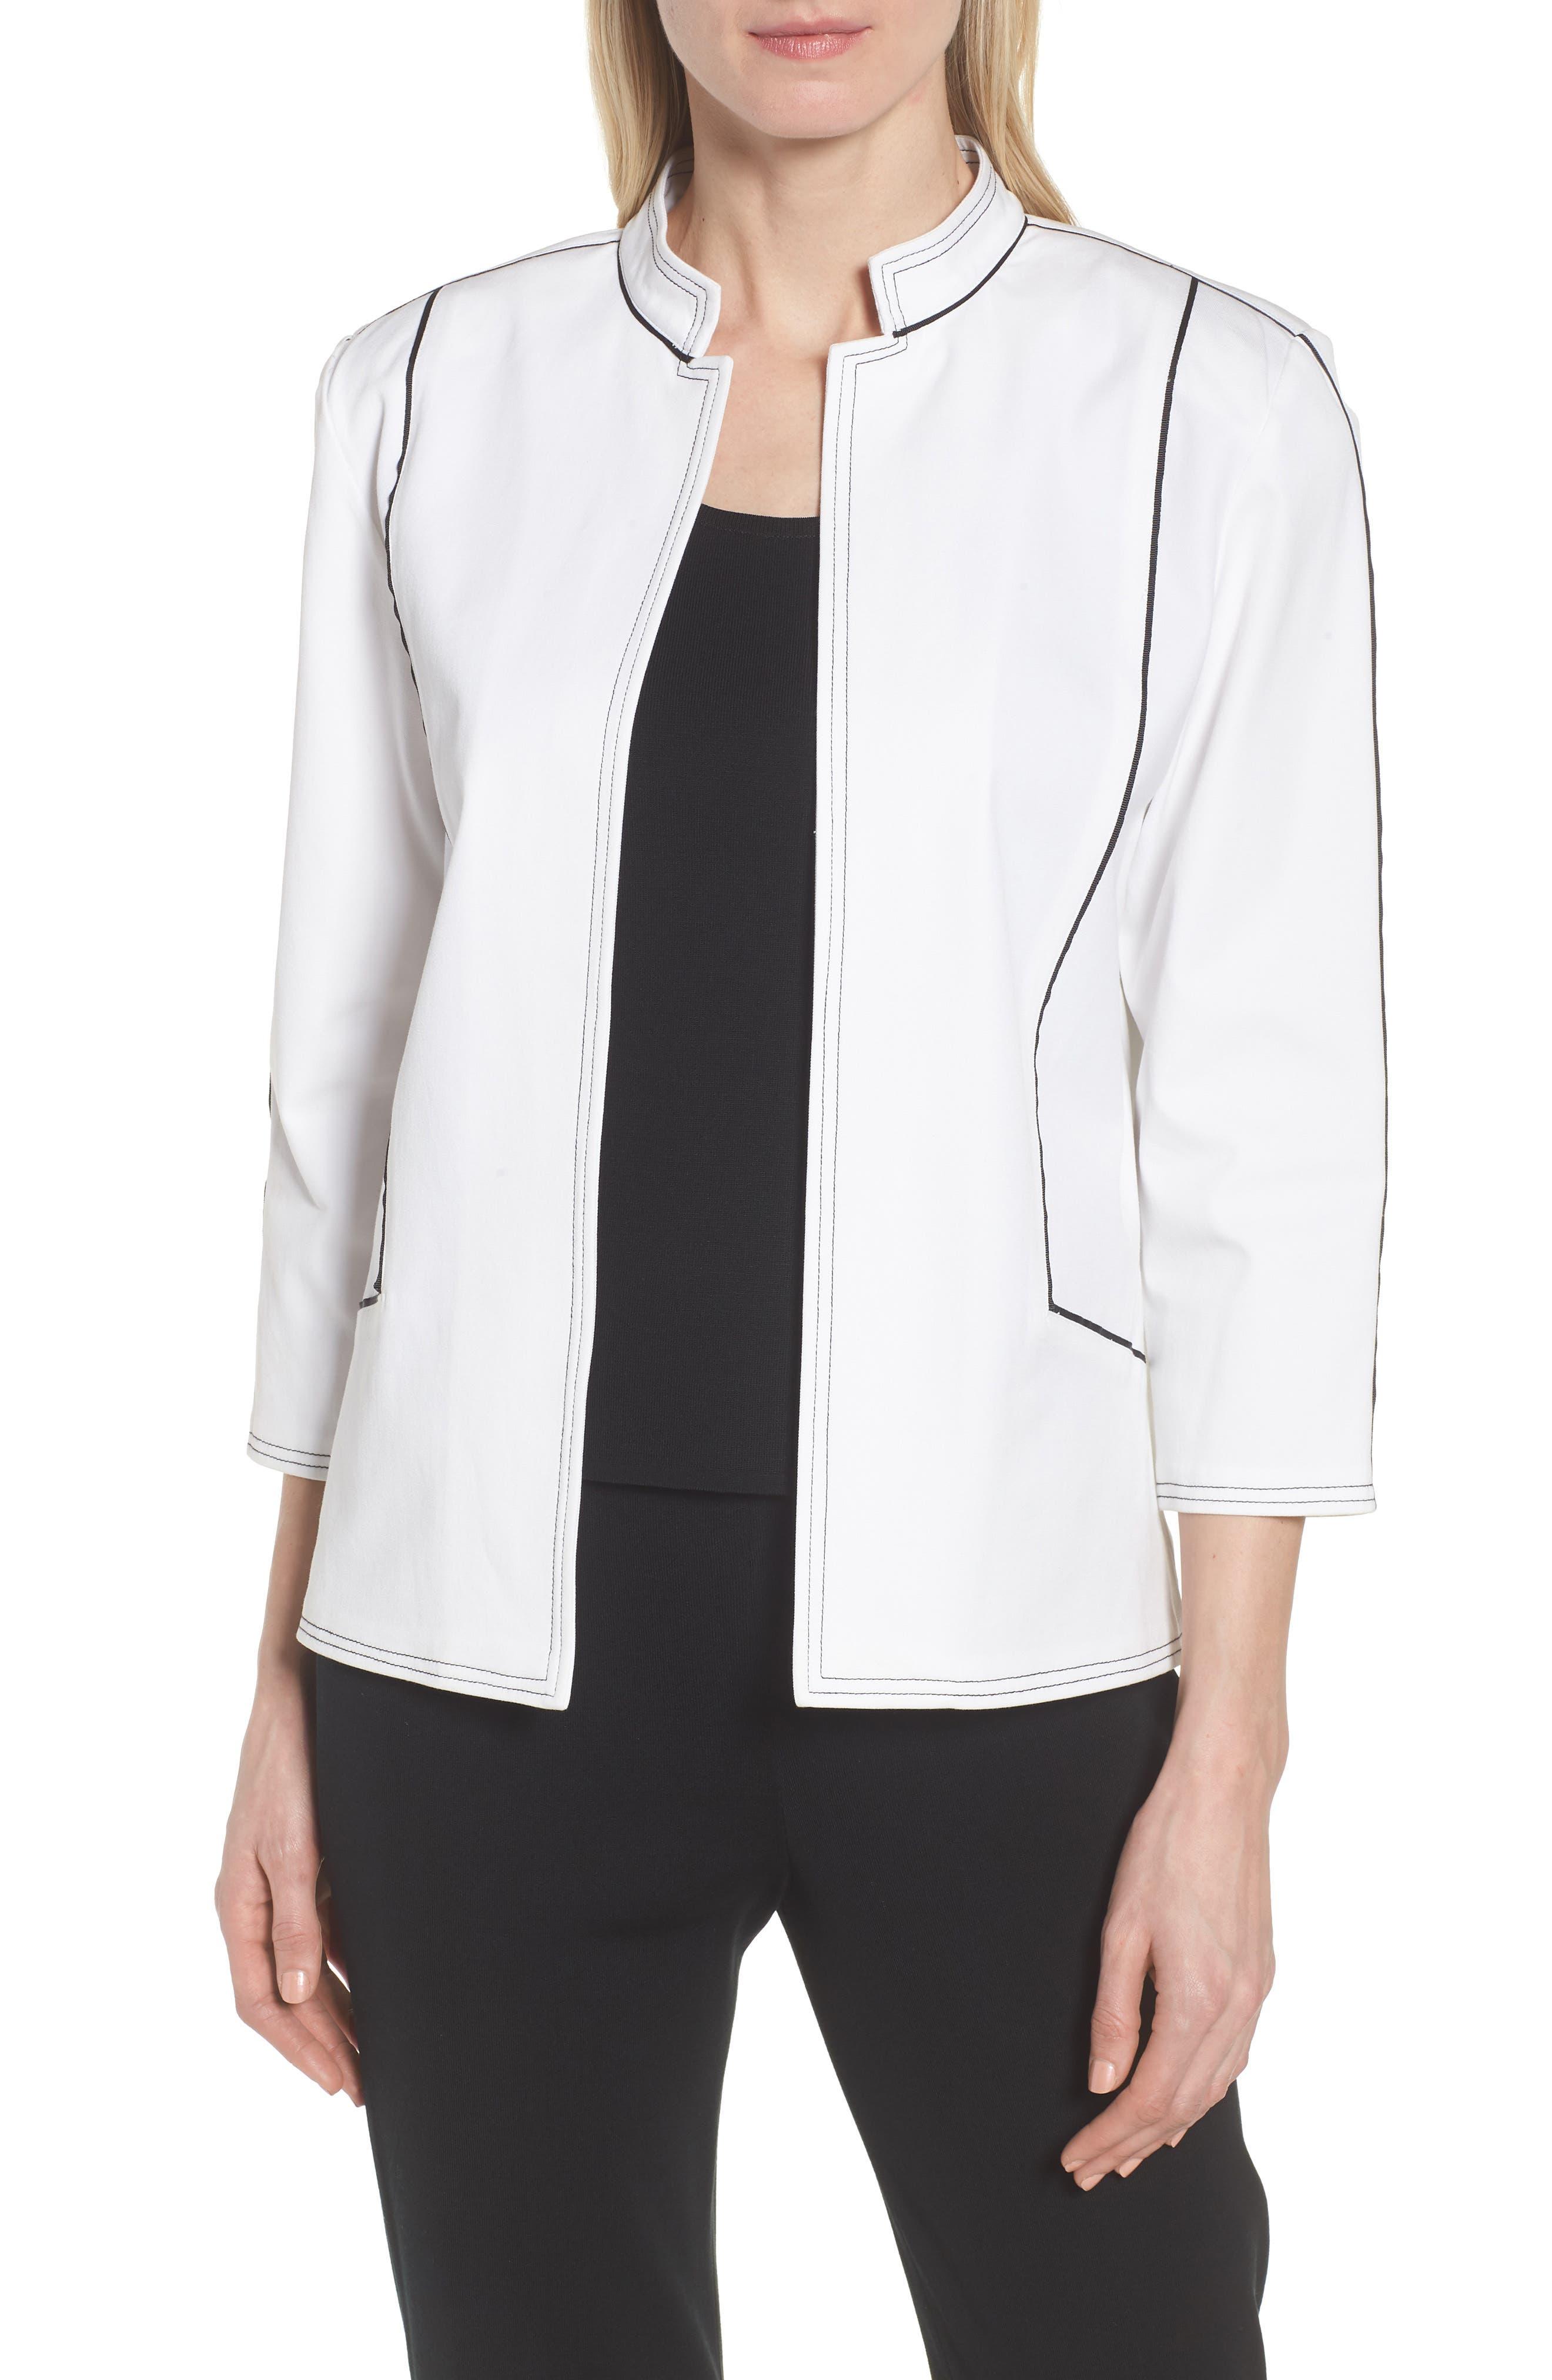 Mandarin Collar Stitch Trim Jacket,                             Main thumbnail 1, color,                             White/ Black